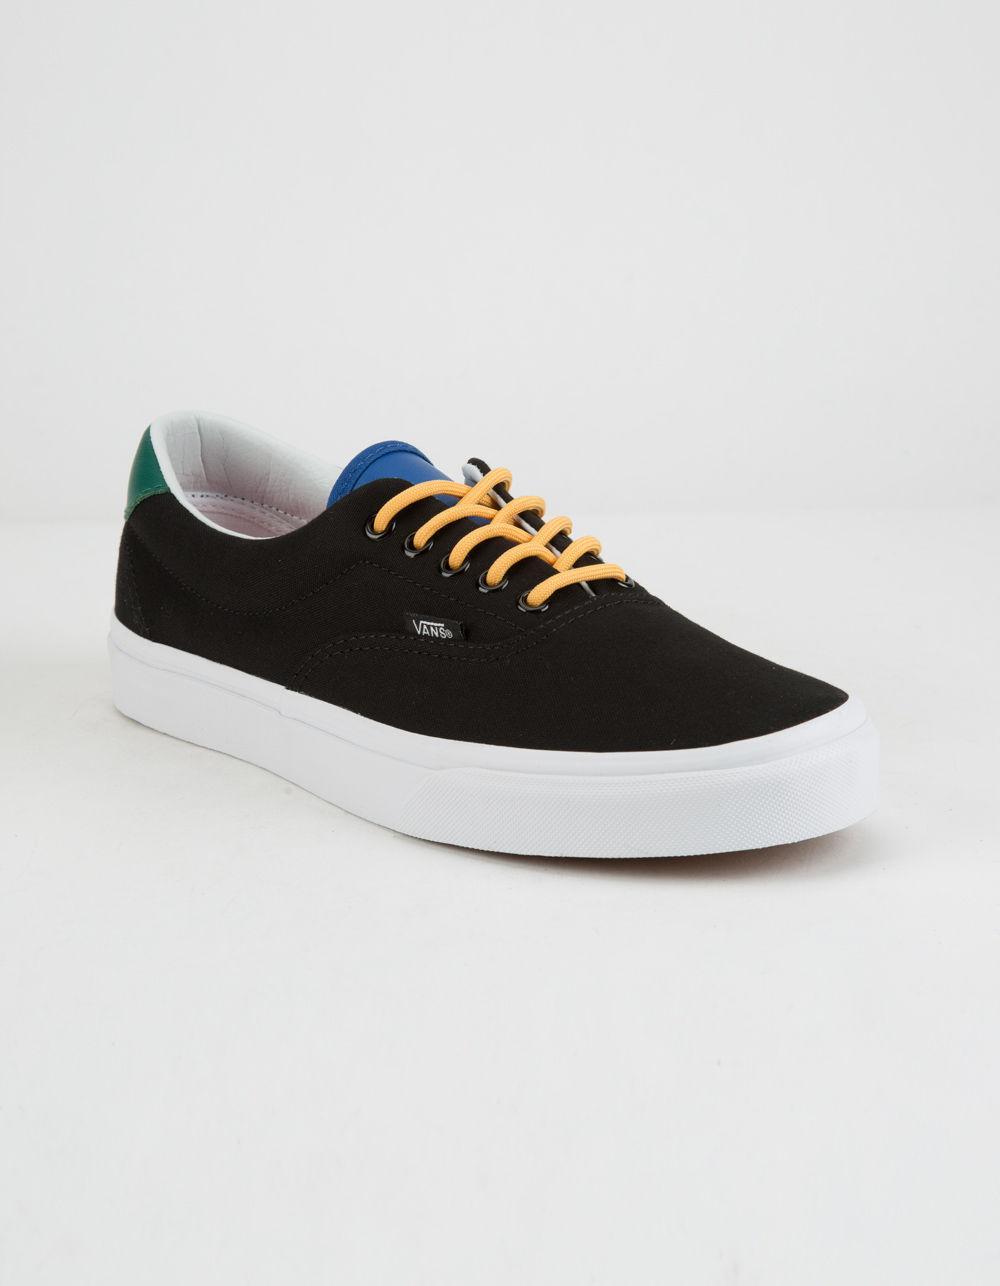 5e19c8a2c0f Lyst - Vans Yacht Club Era 59 Black Mens Shoes in Black for Men